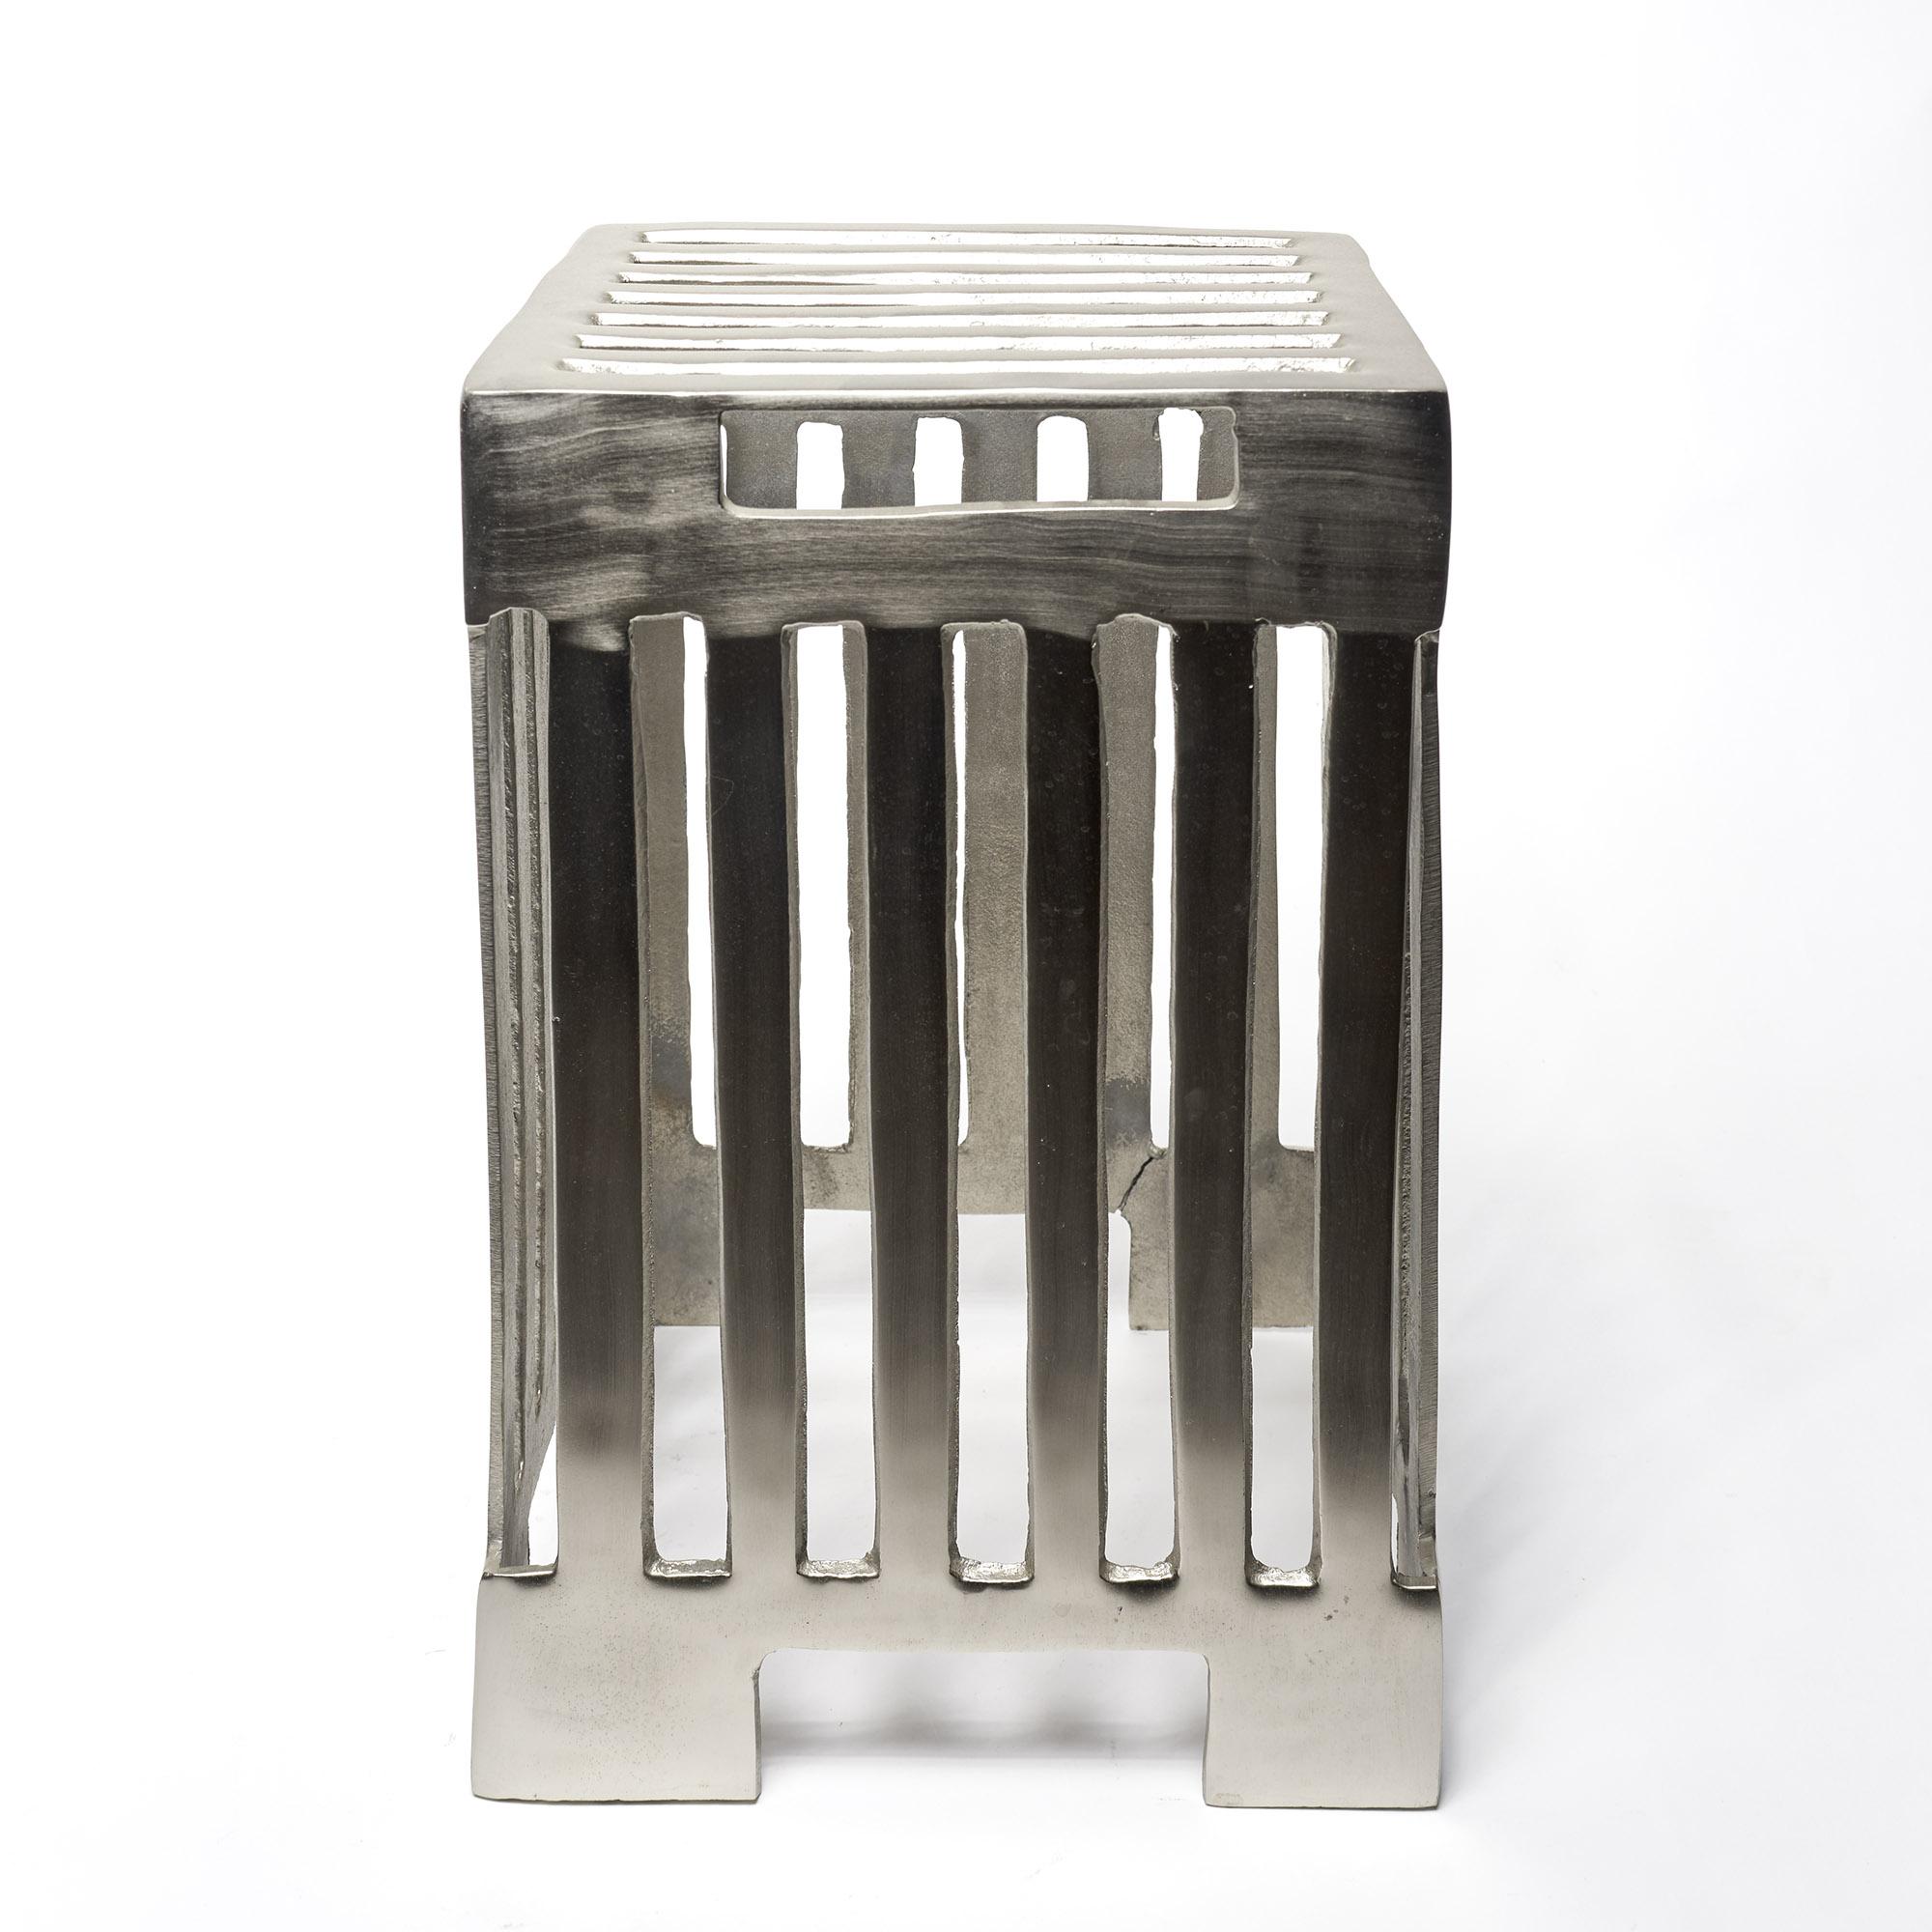 Mesa banco metal plateado barras